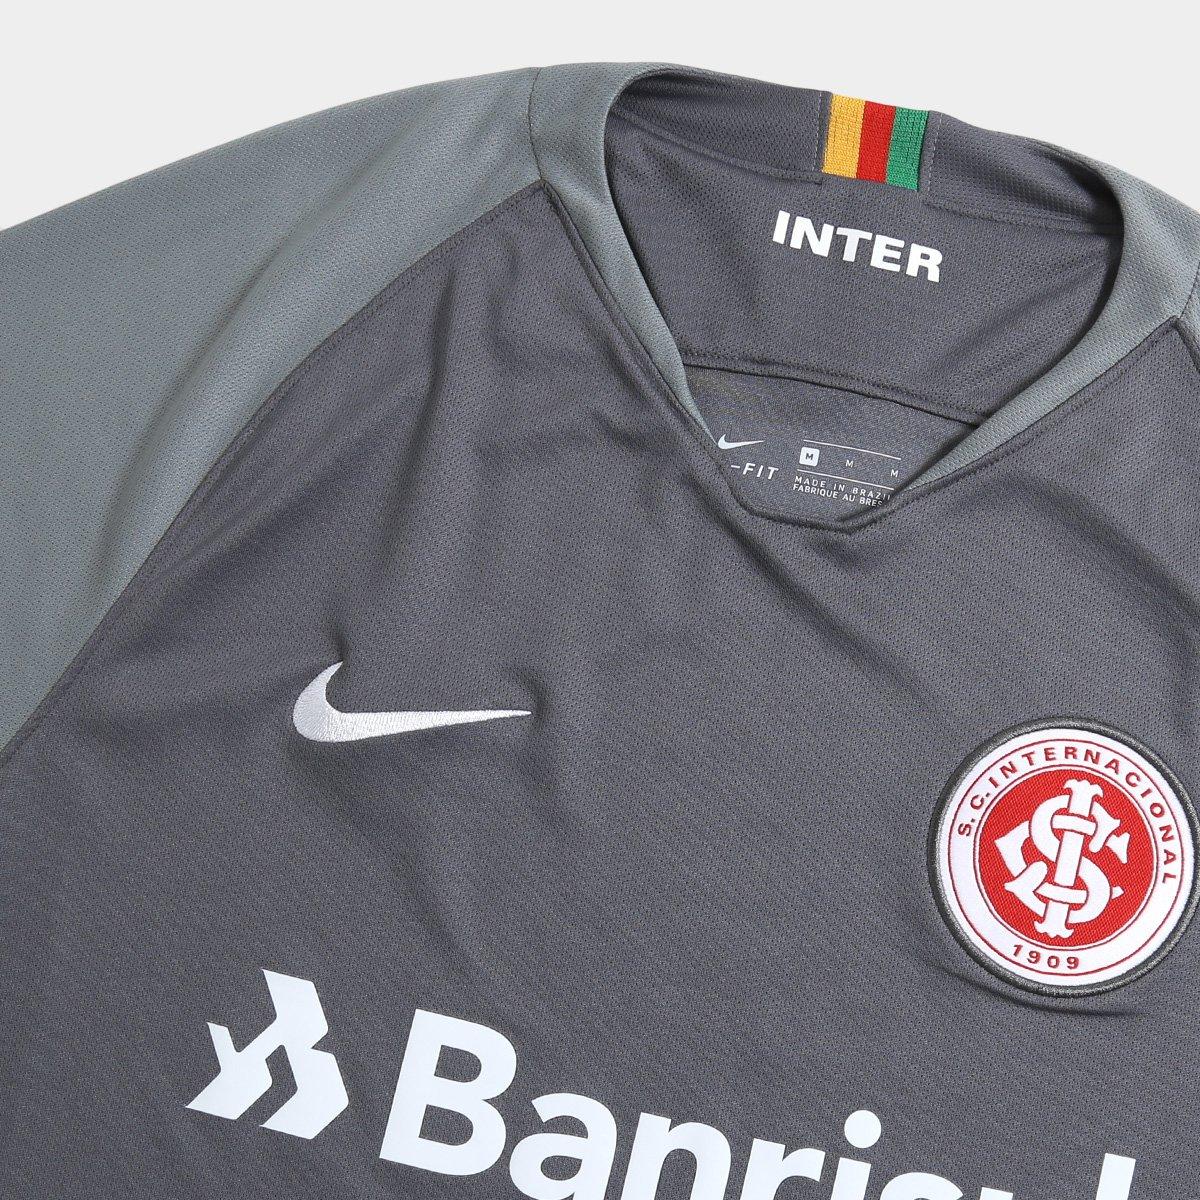 Camisa Internacional III 2018 s n° - Torcedor Nike Masculina - Cinza ... 5aef8d2cabb7f